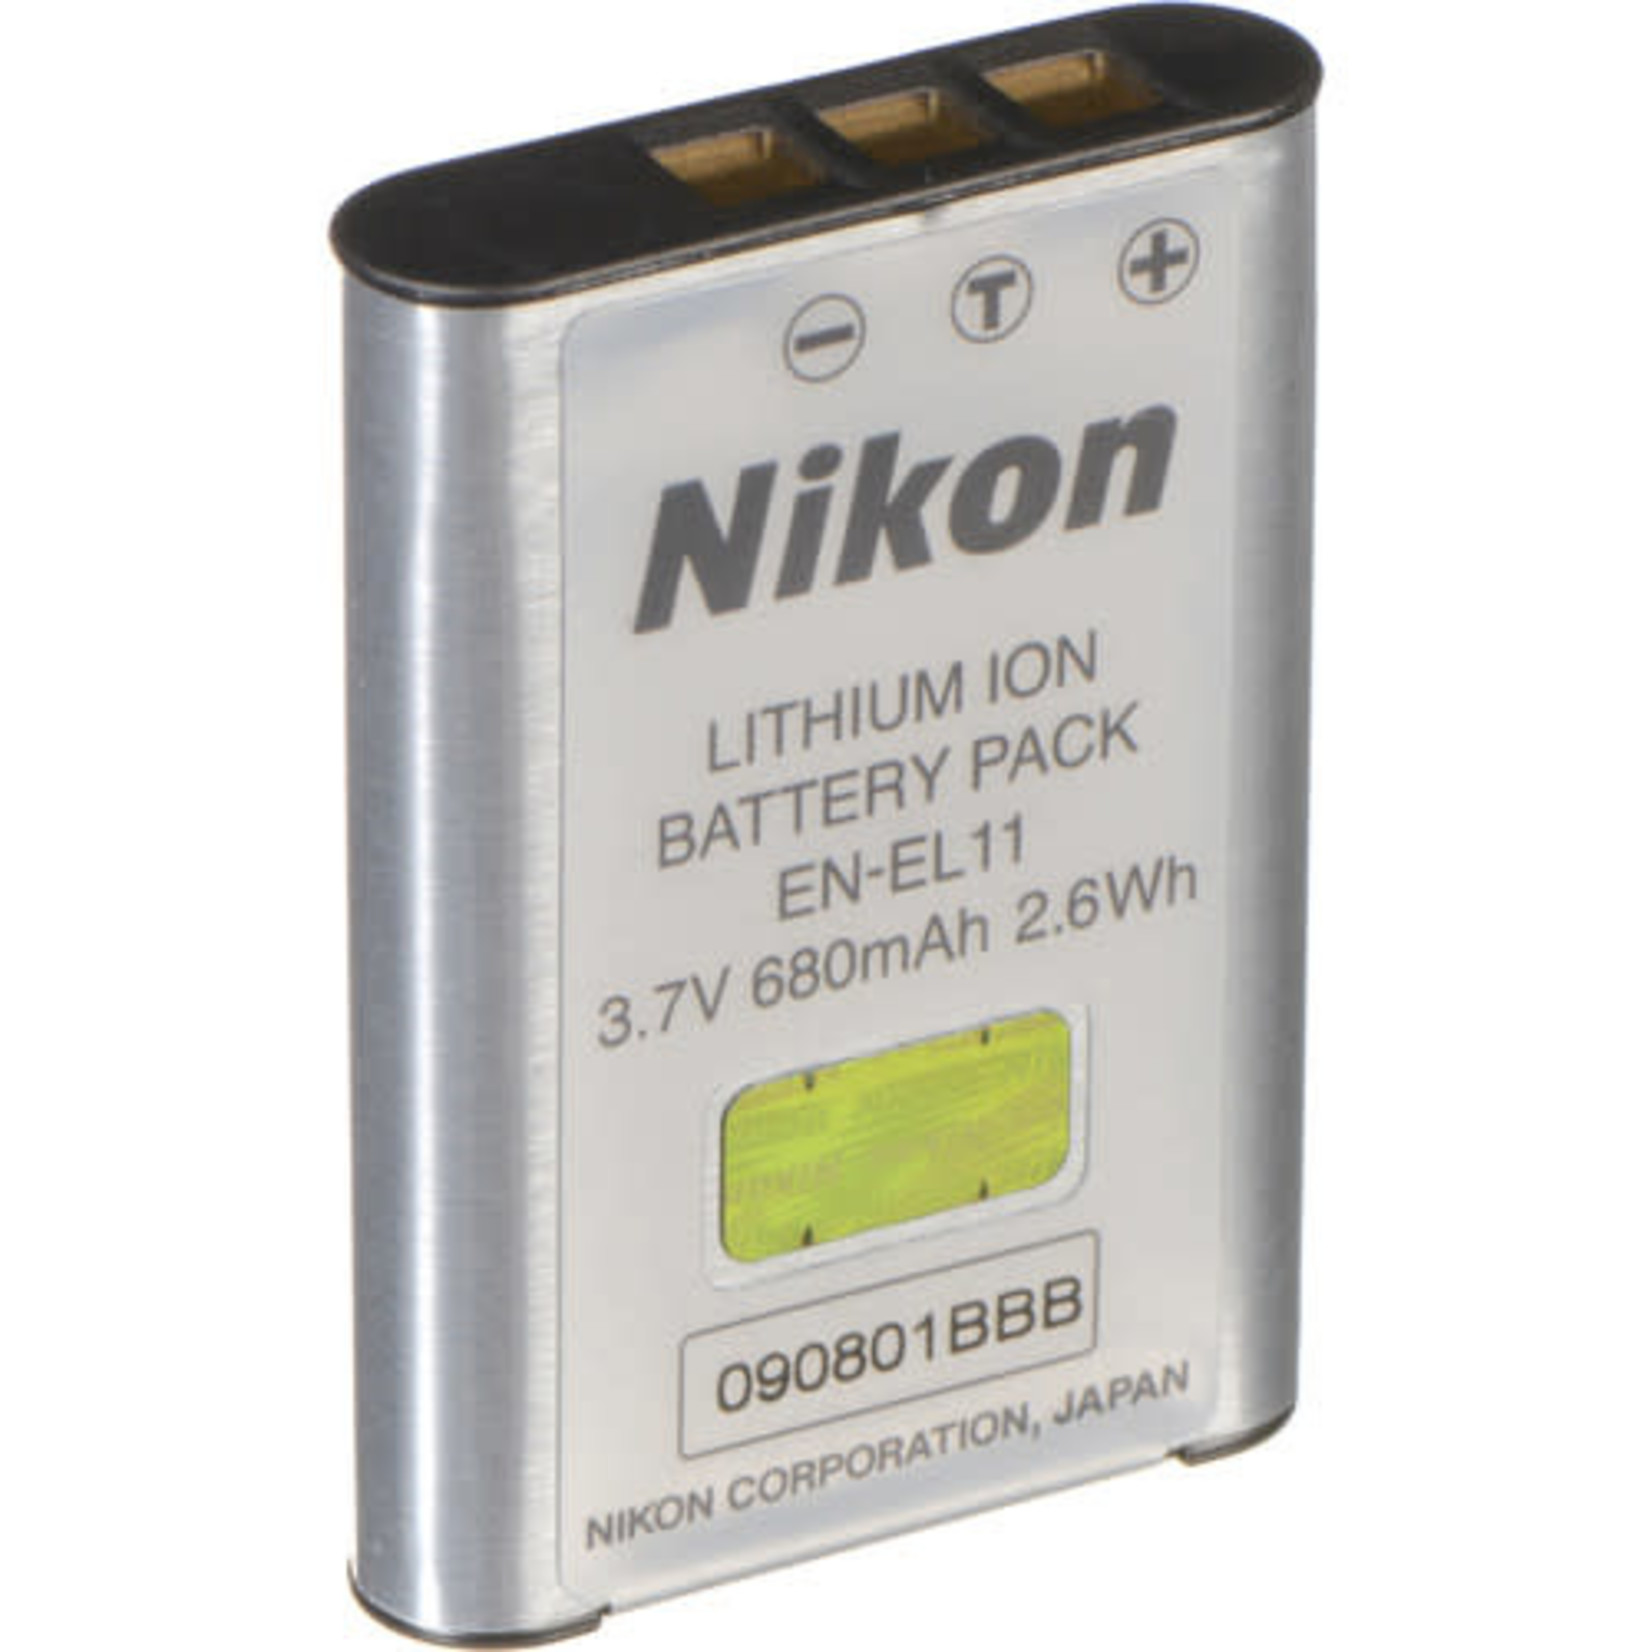 Nikon Nikon EN-EL11 Rechargeable Lithium-Ion Battery